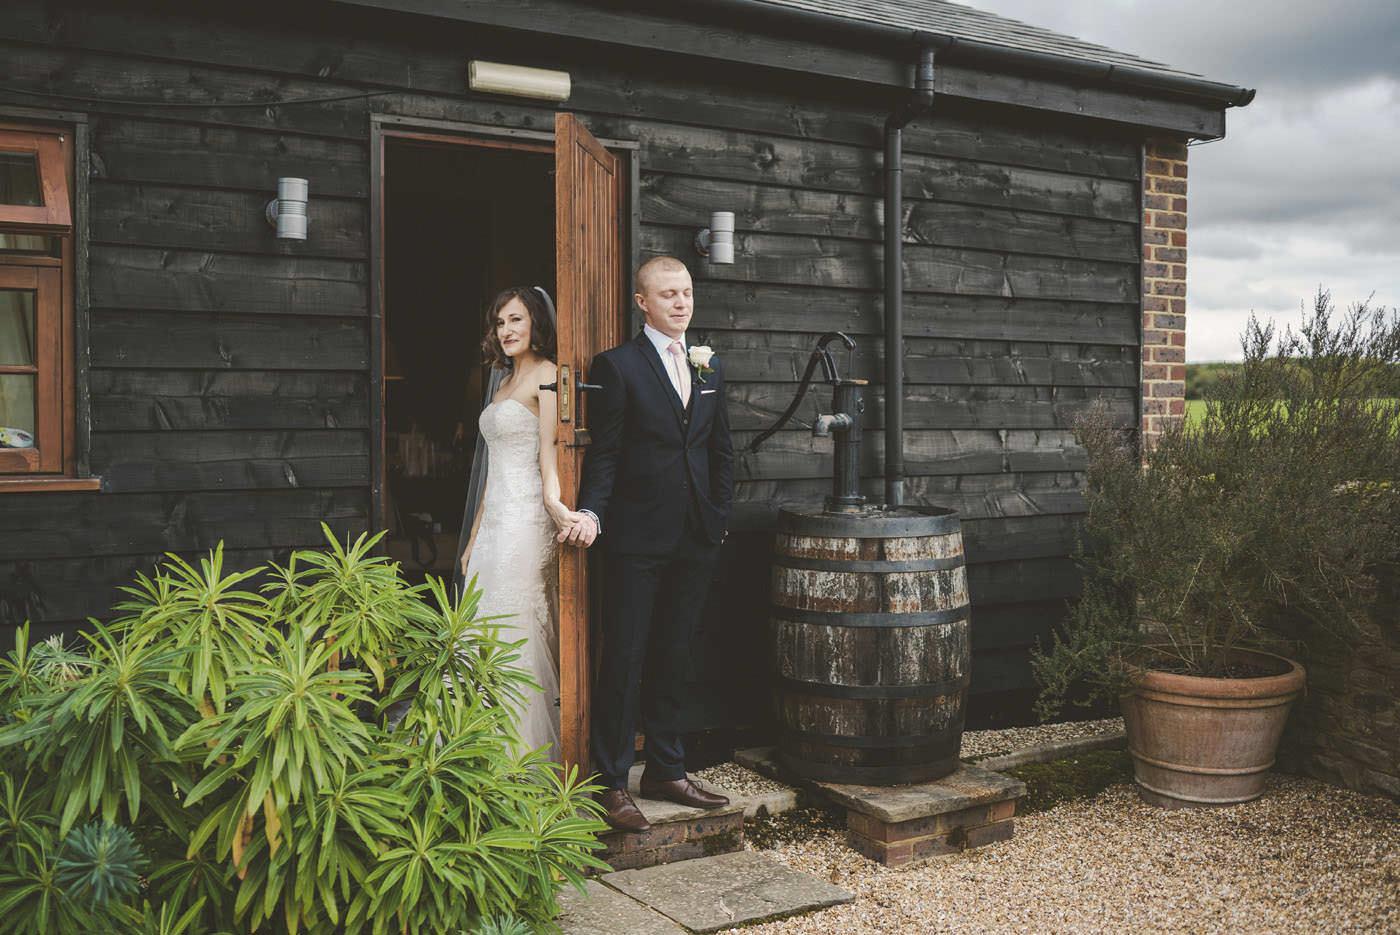 adamzoe gate street barn wedding photographer 0035